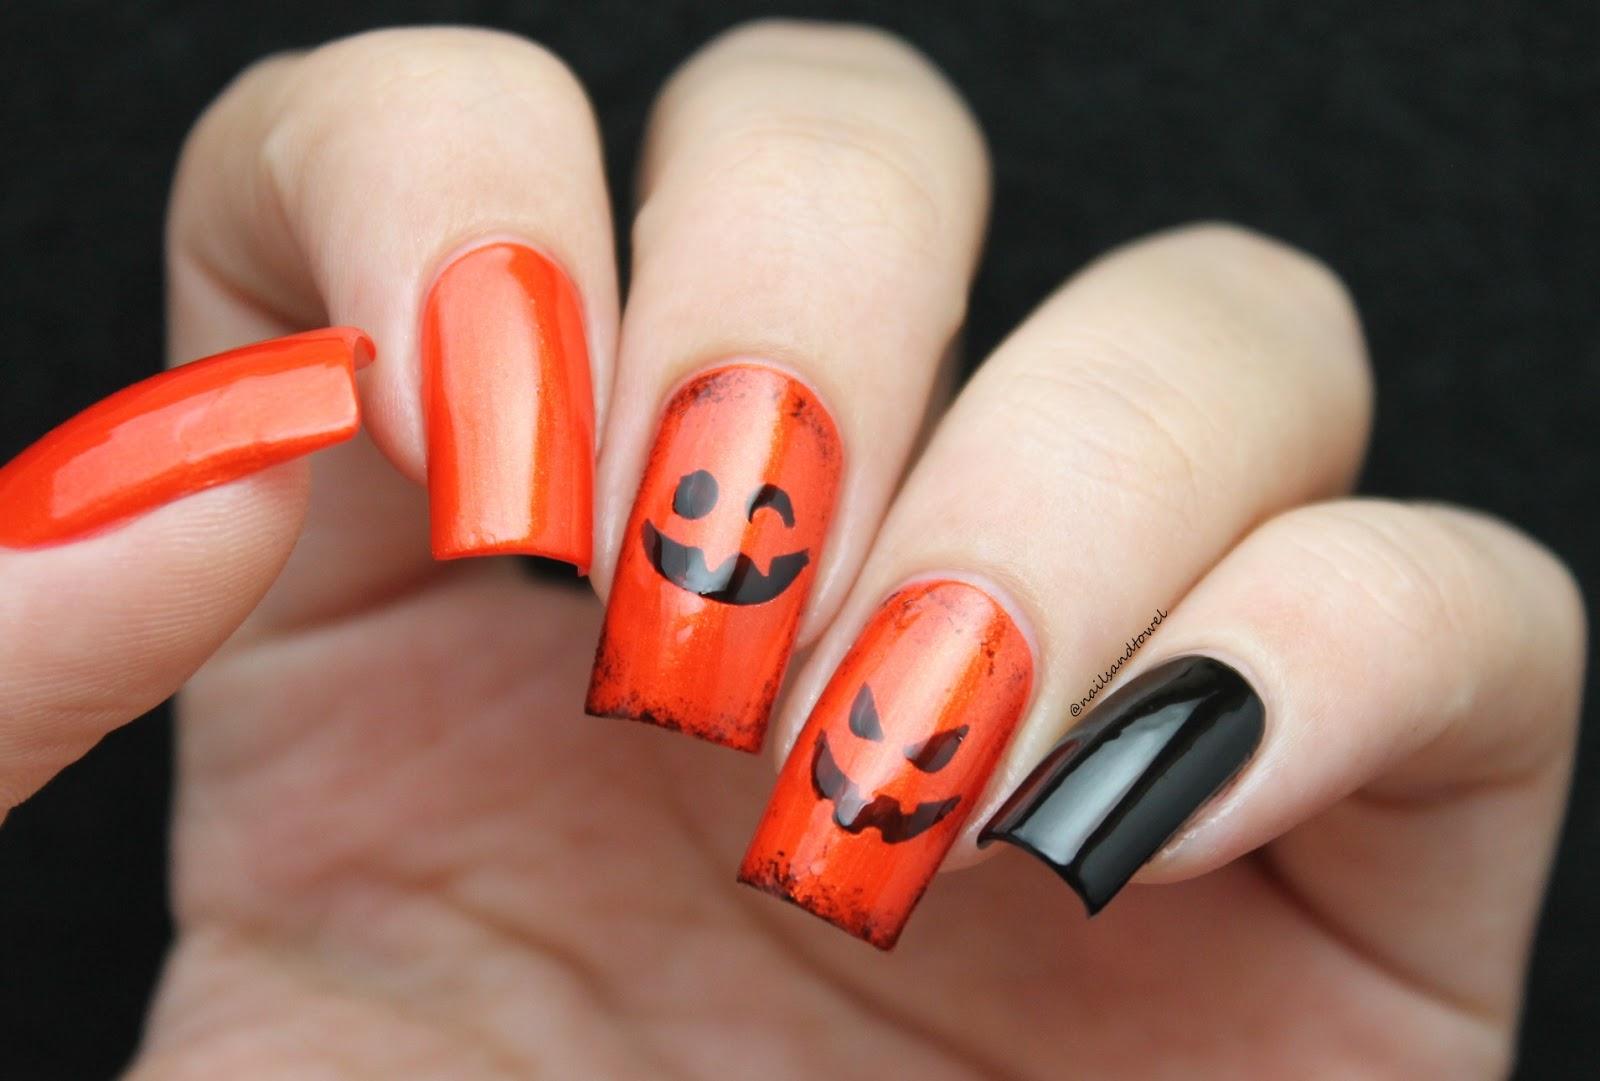 my nail art journal: cute pumpkin faces - halloween nails + bundle